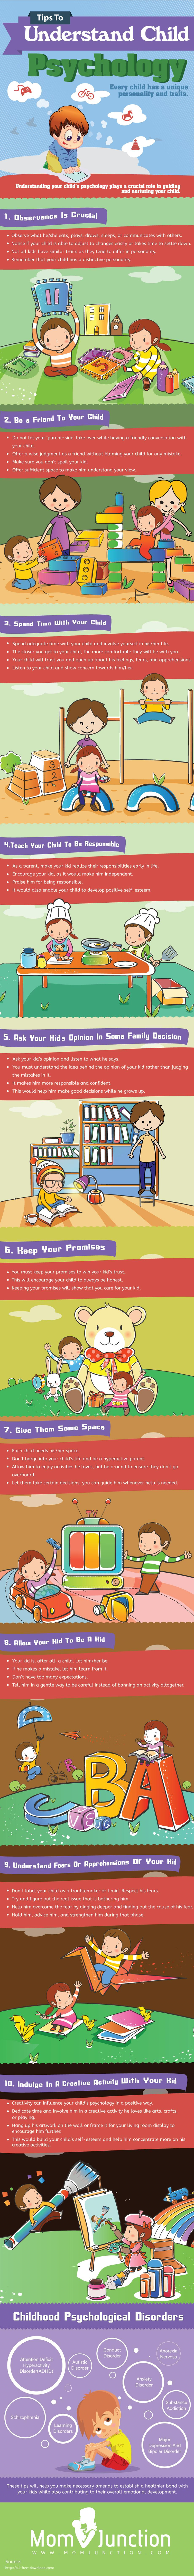 11 Tips for Understanding Your Child's Emotional Development